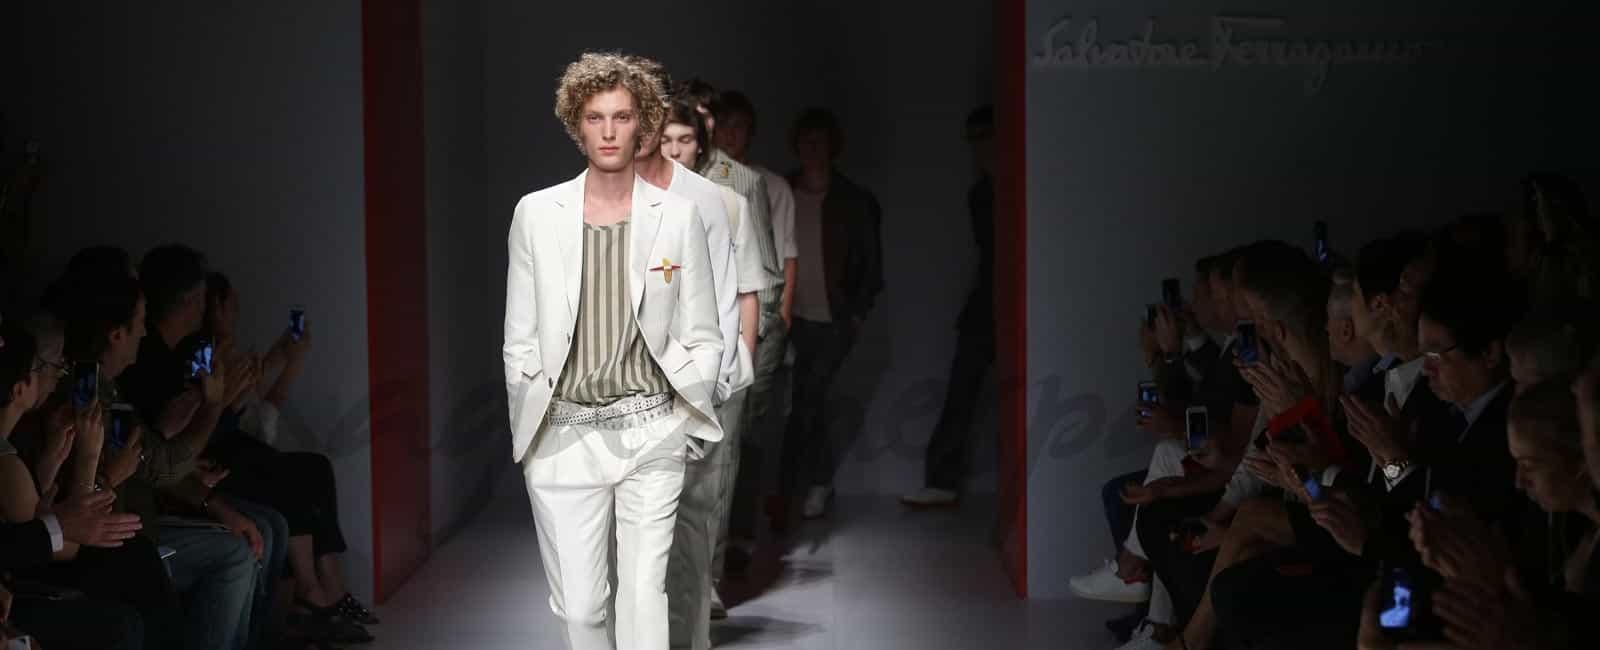 Milan Men Fashion Week 2016: Ferragamo